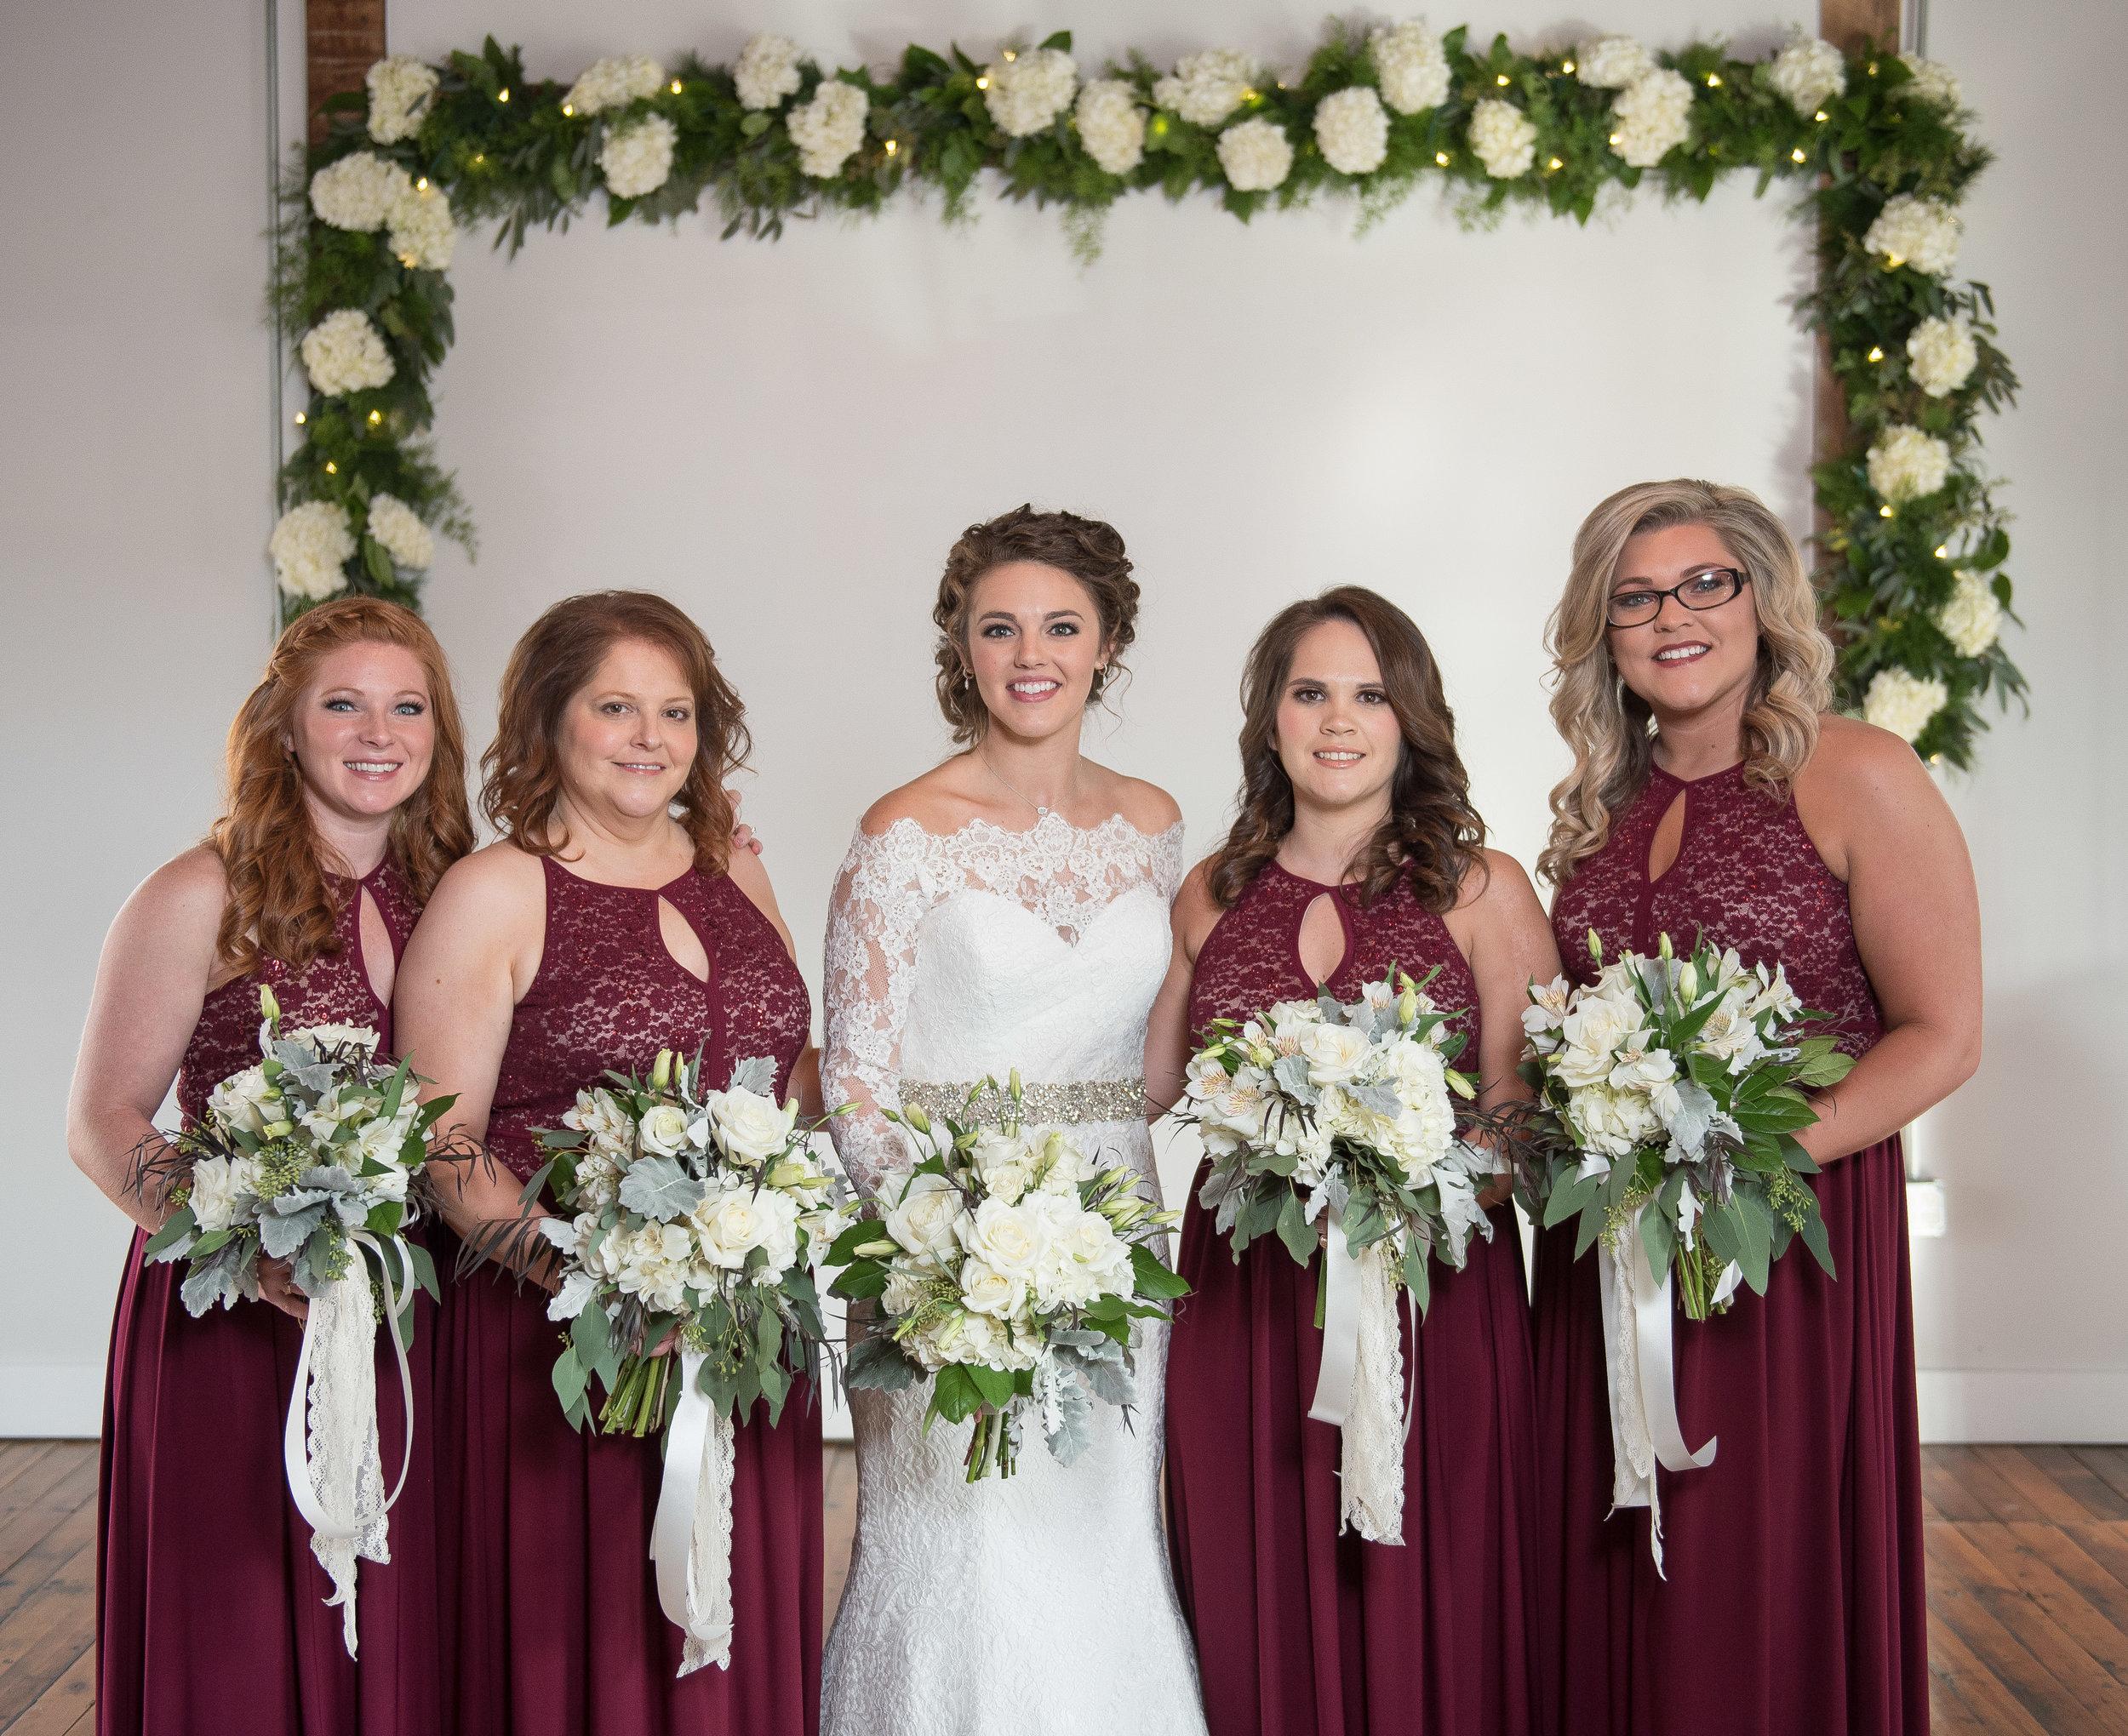 The Roller Mill Events - Winston Salem Weddings - NC Weddings - High Point NC Weddings - Winston Salem Venue - Yasmin Leonard Photography-26.jpg